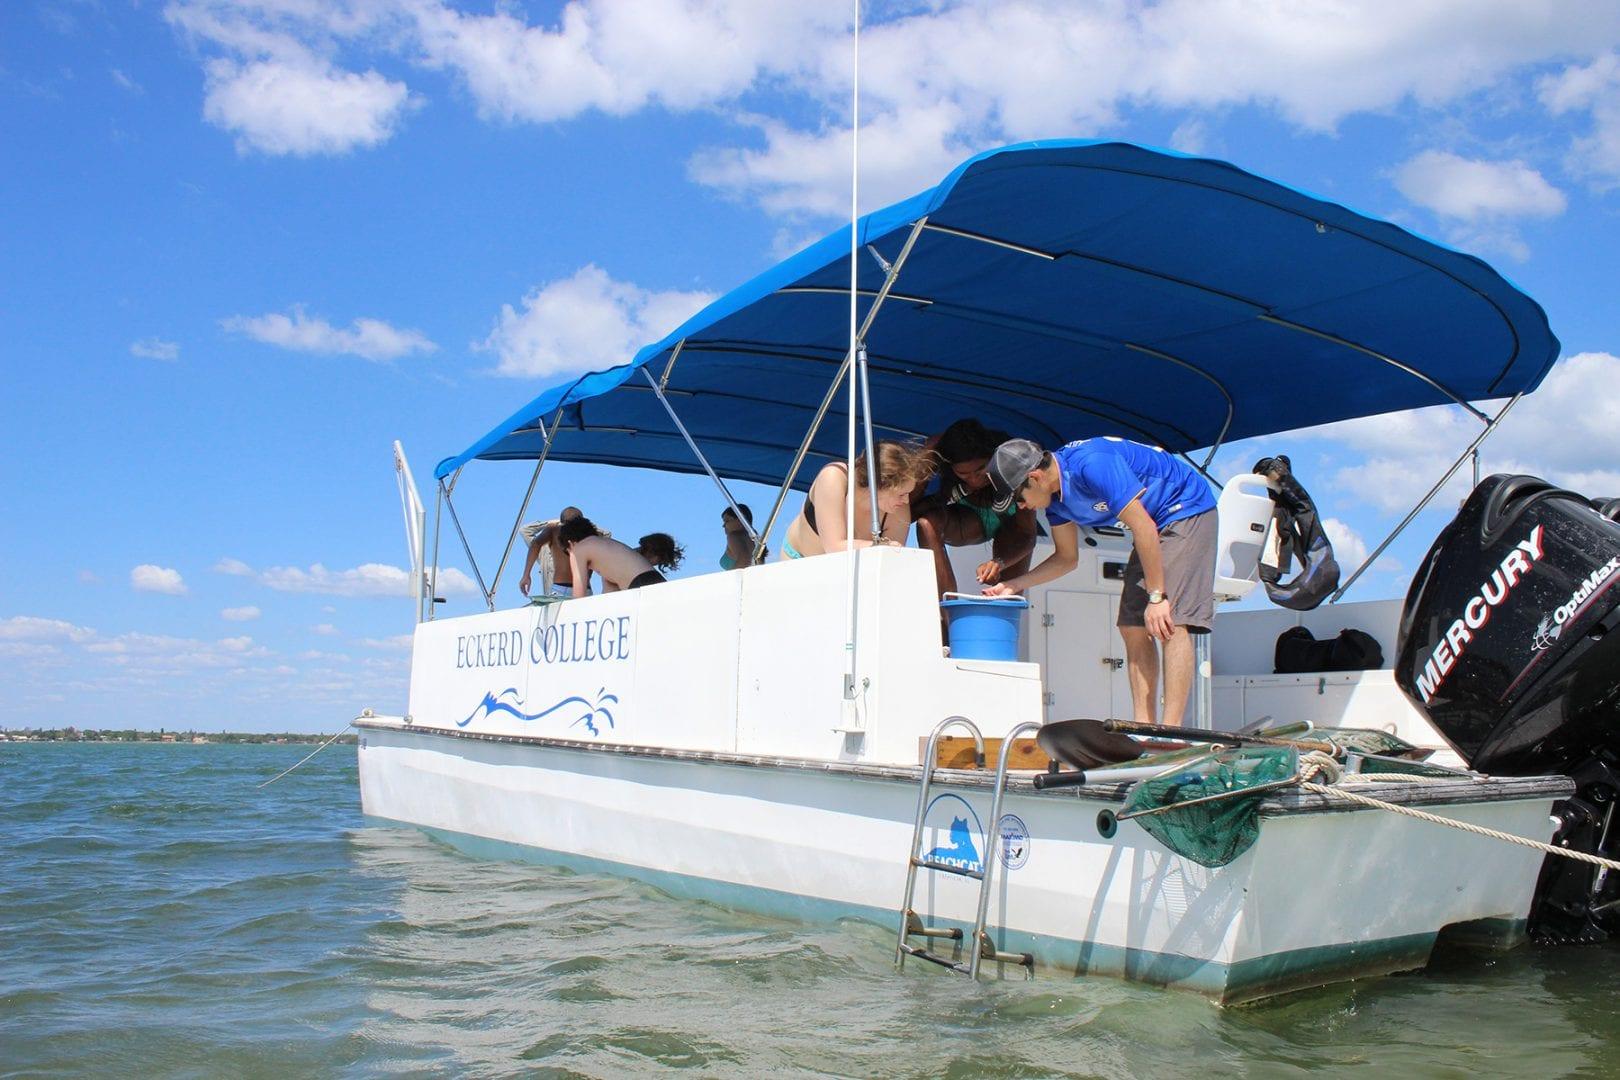 Students studying specimens aboard the Eckerd College catamaran